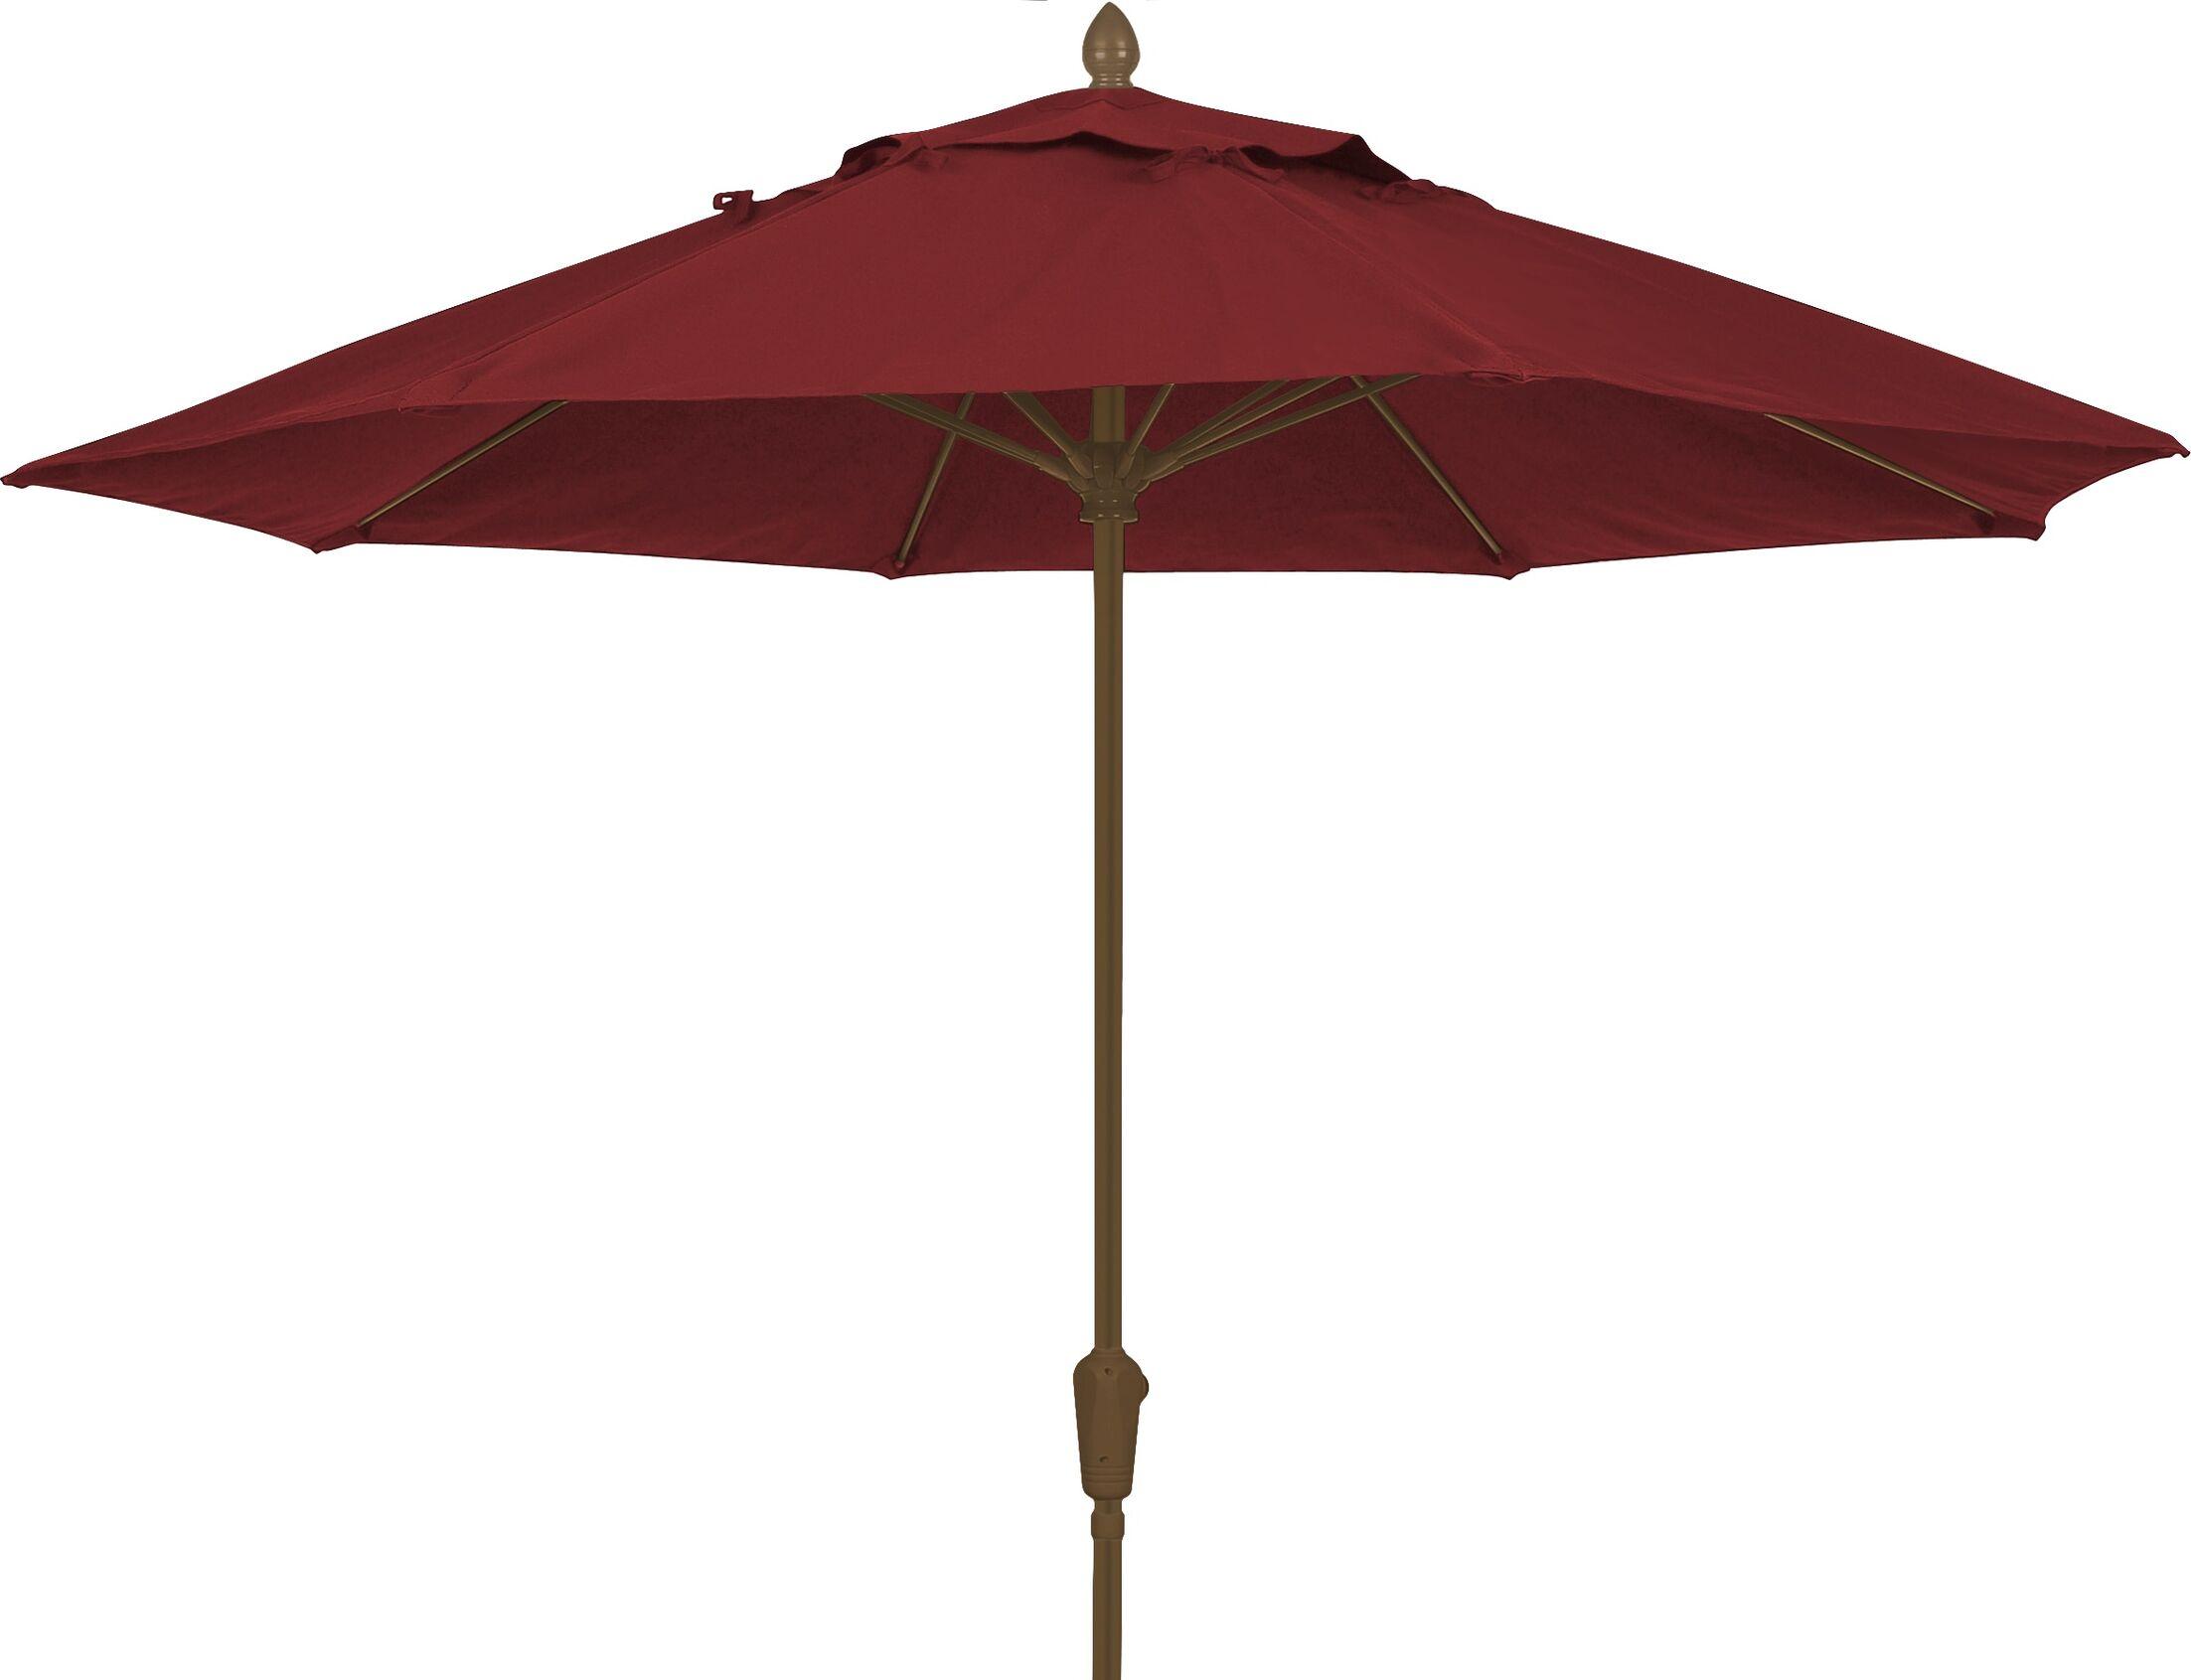 Prestige 7.5' Market Umbrella Frame Finish: Champagne Bronze, Fabric: Burgundy